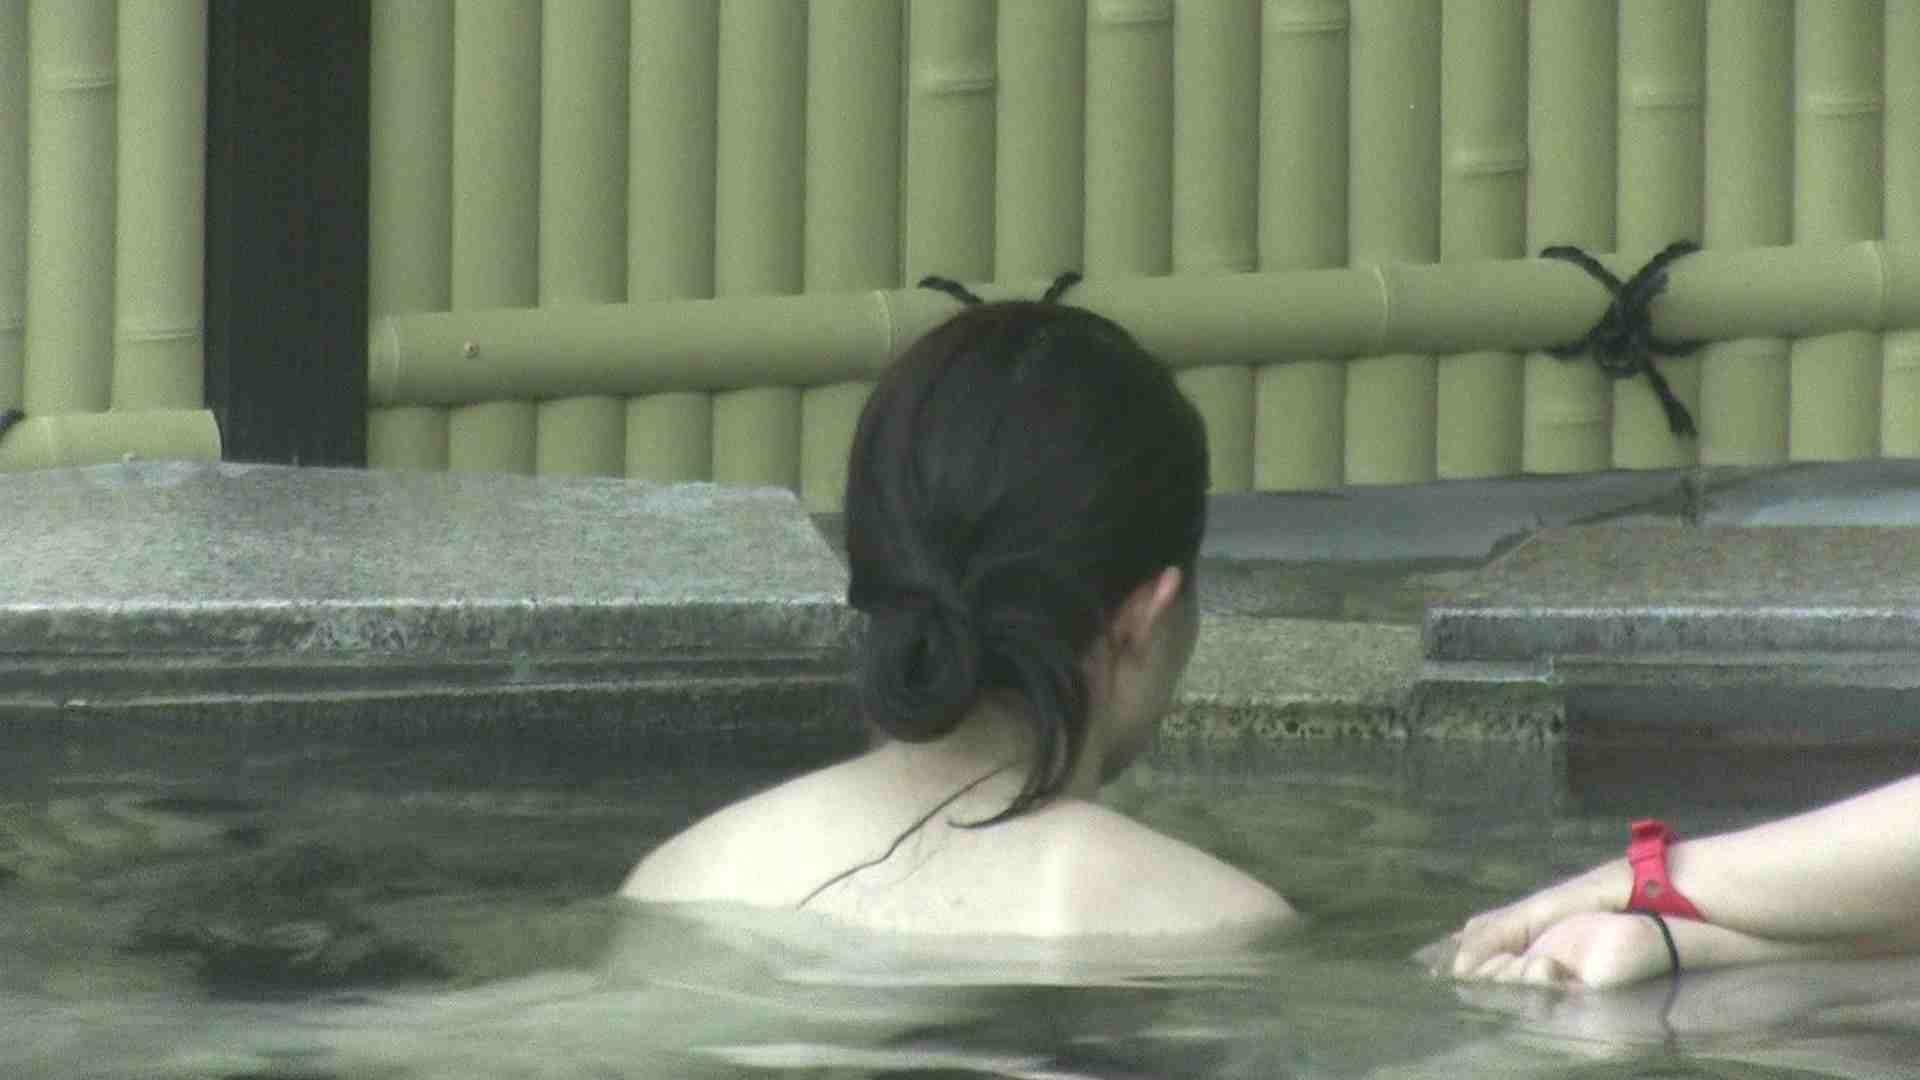 Aquaな露天風呂Vol.194 露天風呂編  110PIX 58